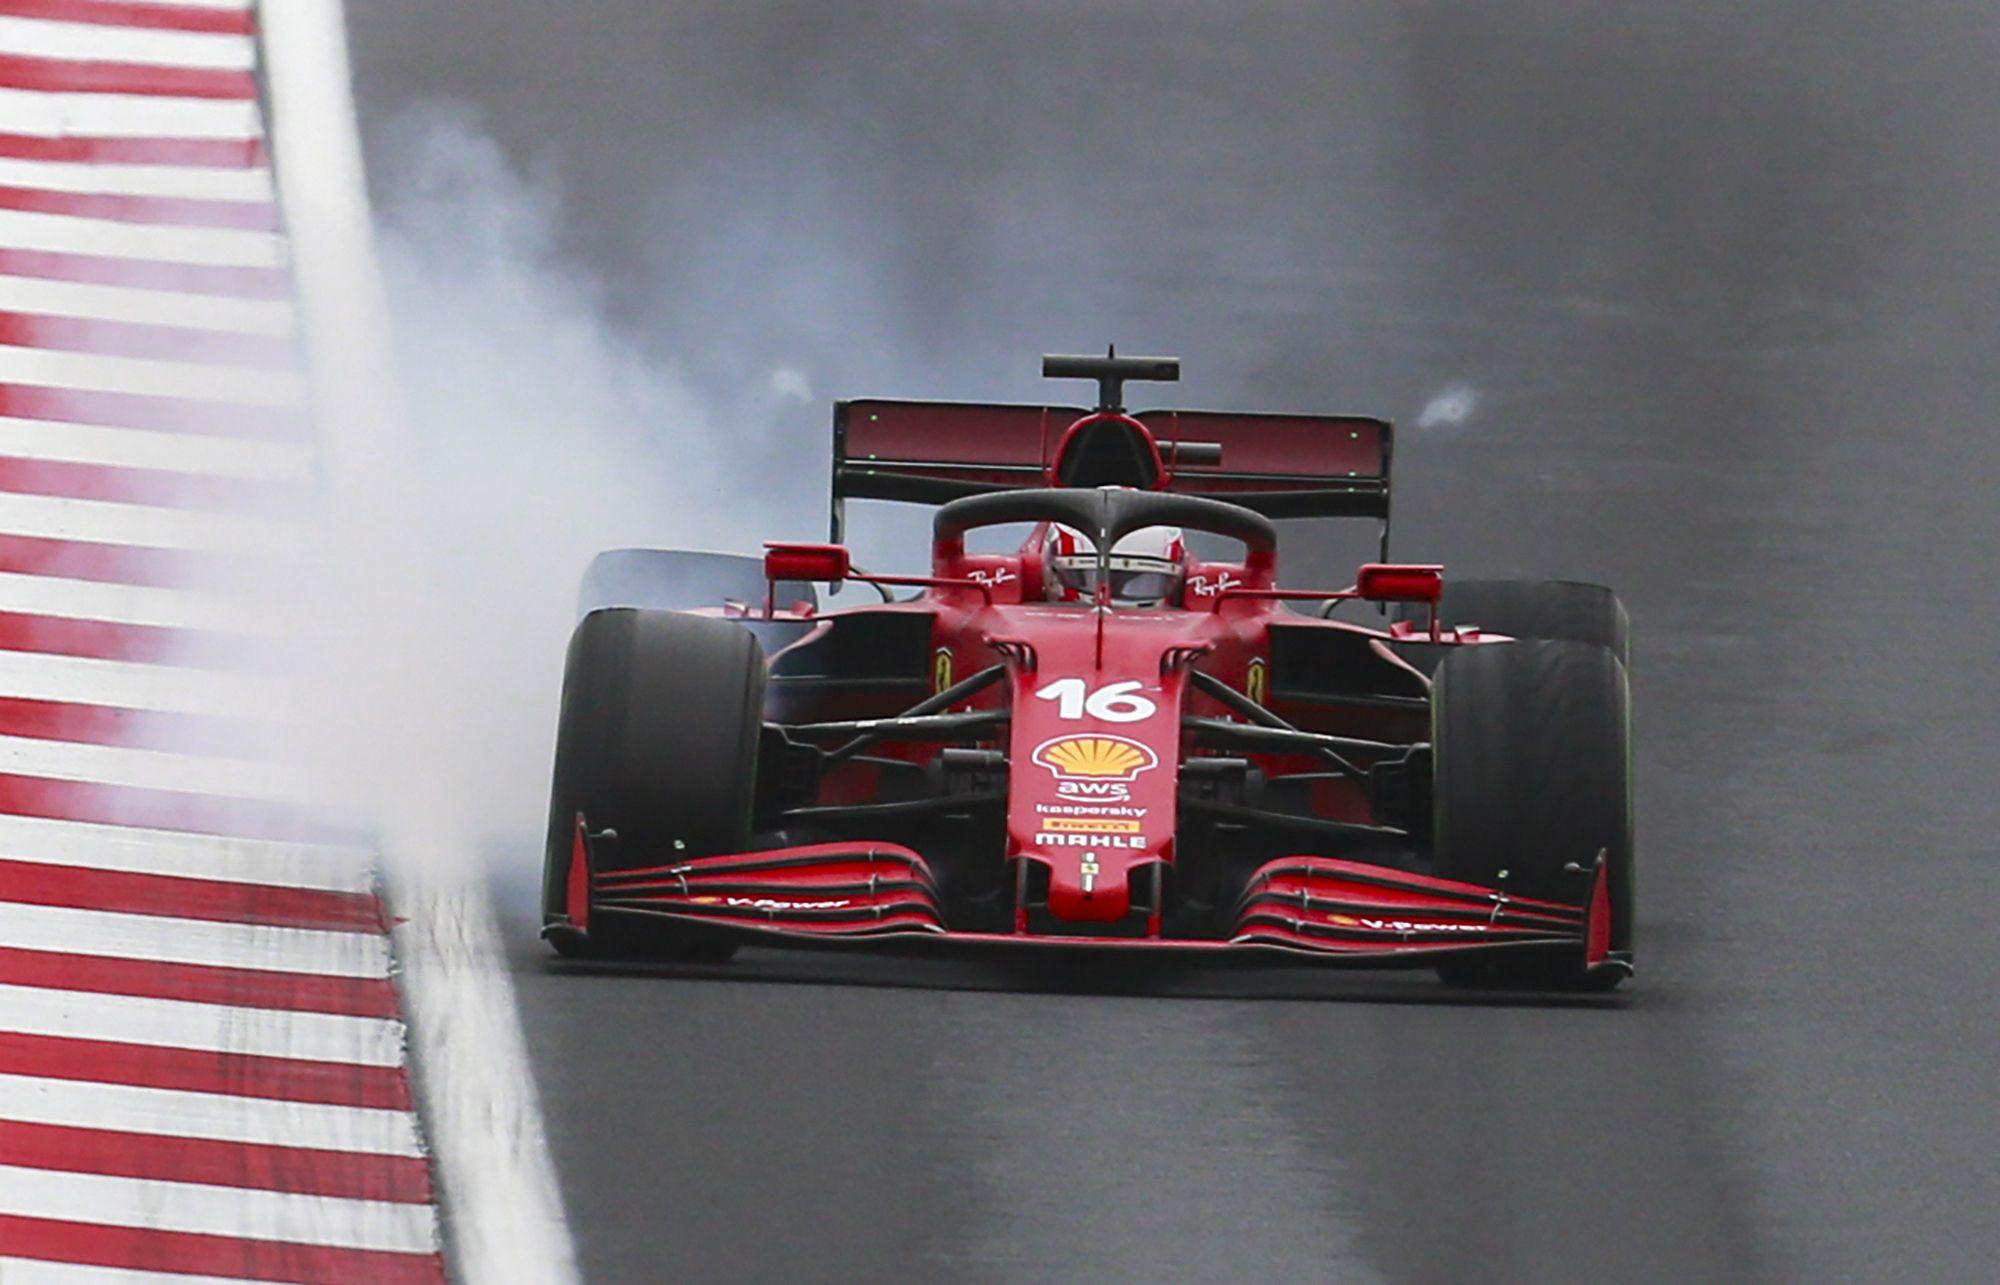 f1: gp de bahrein iniciara calendario 2022; regresa canada